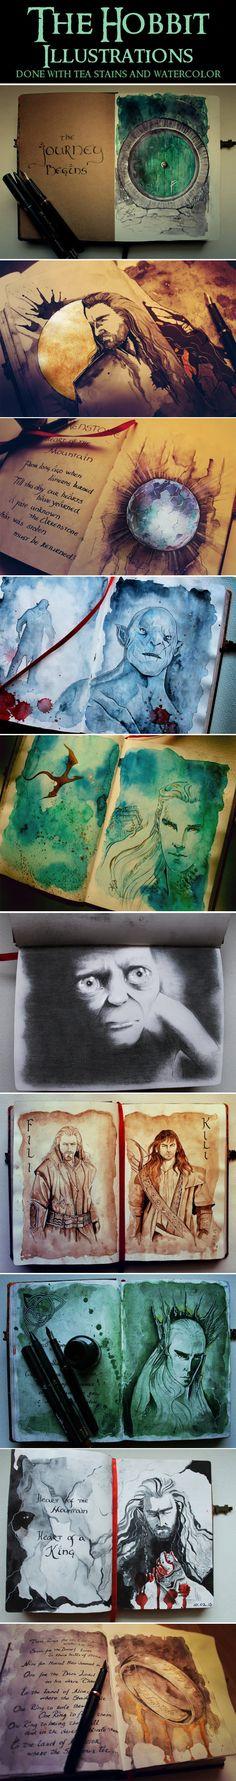 The Hobbit Illustrations. Amazingly beautiful